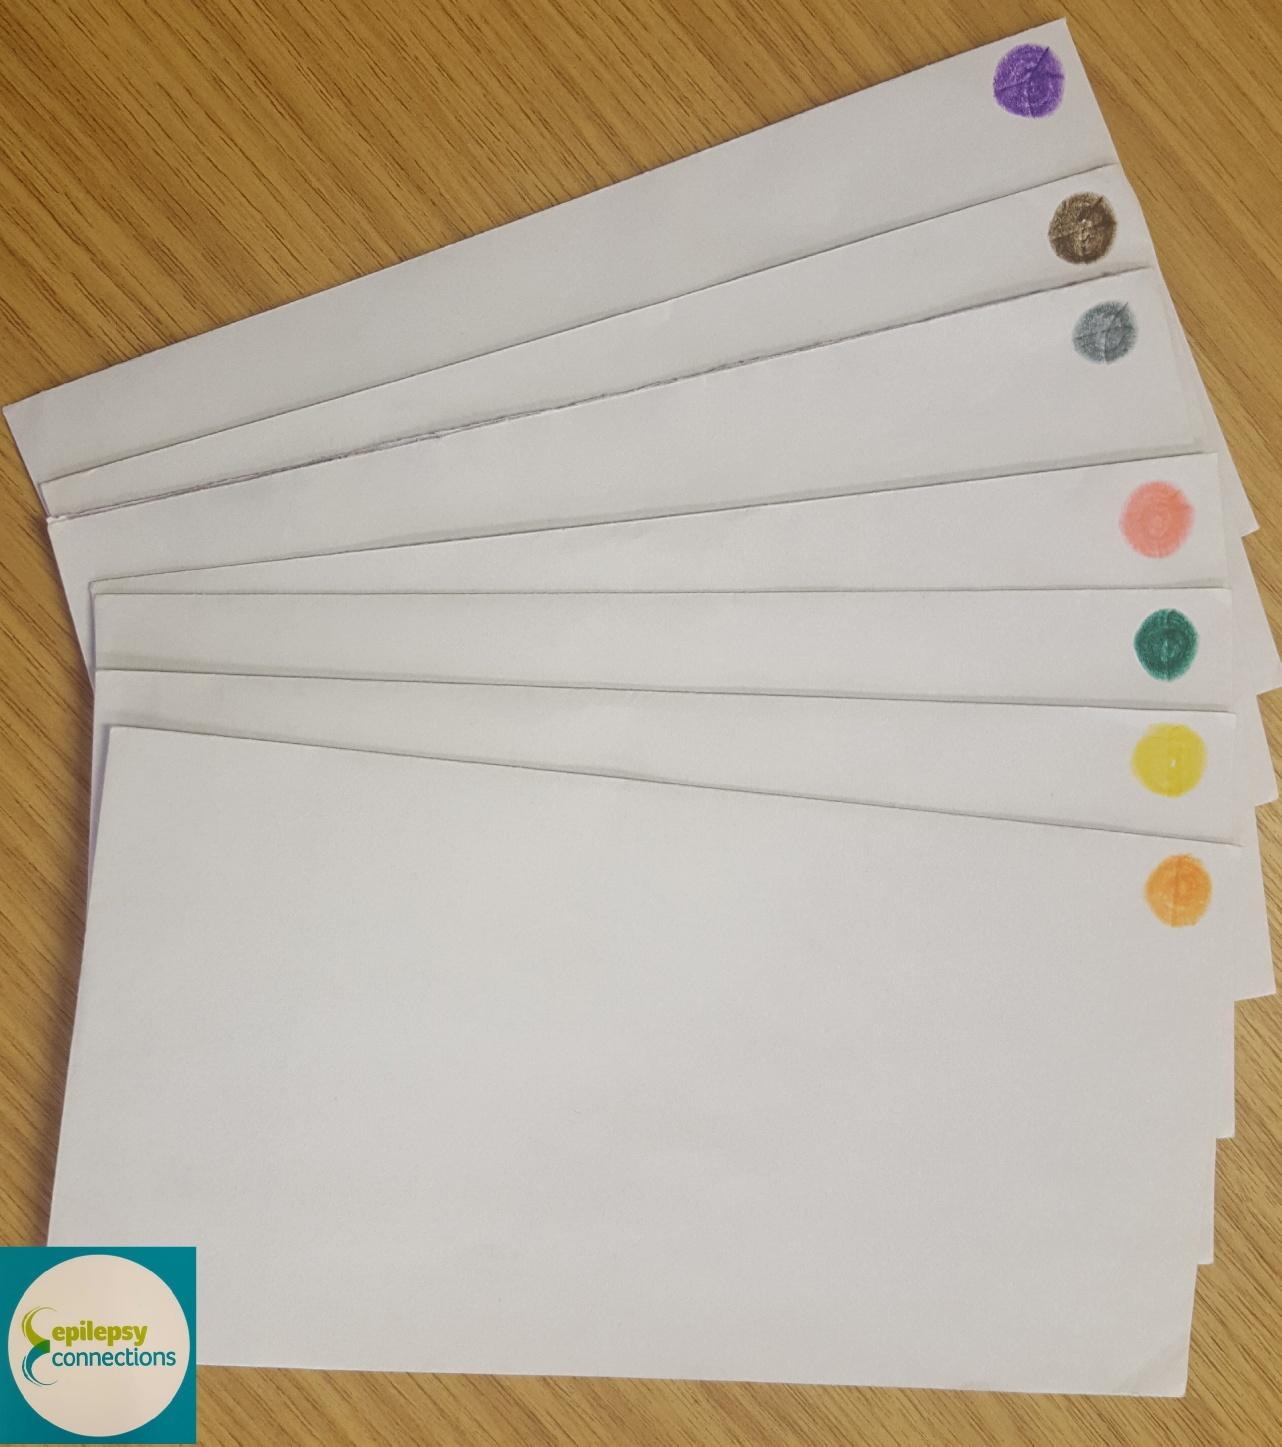 Steven blogging envelopes